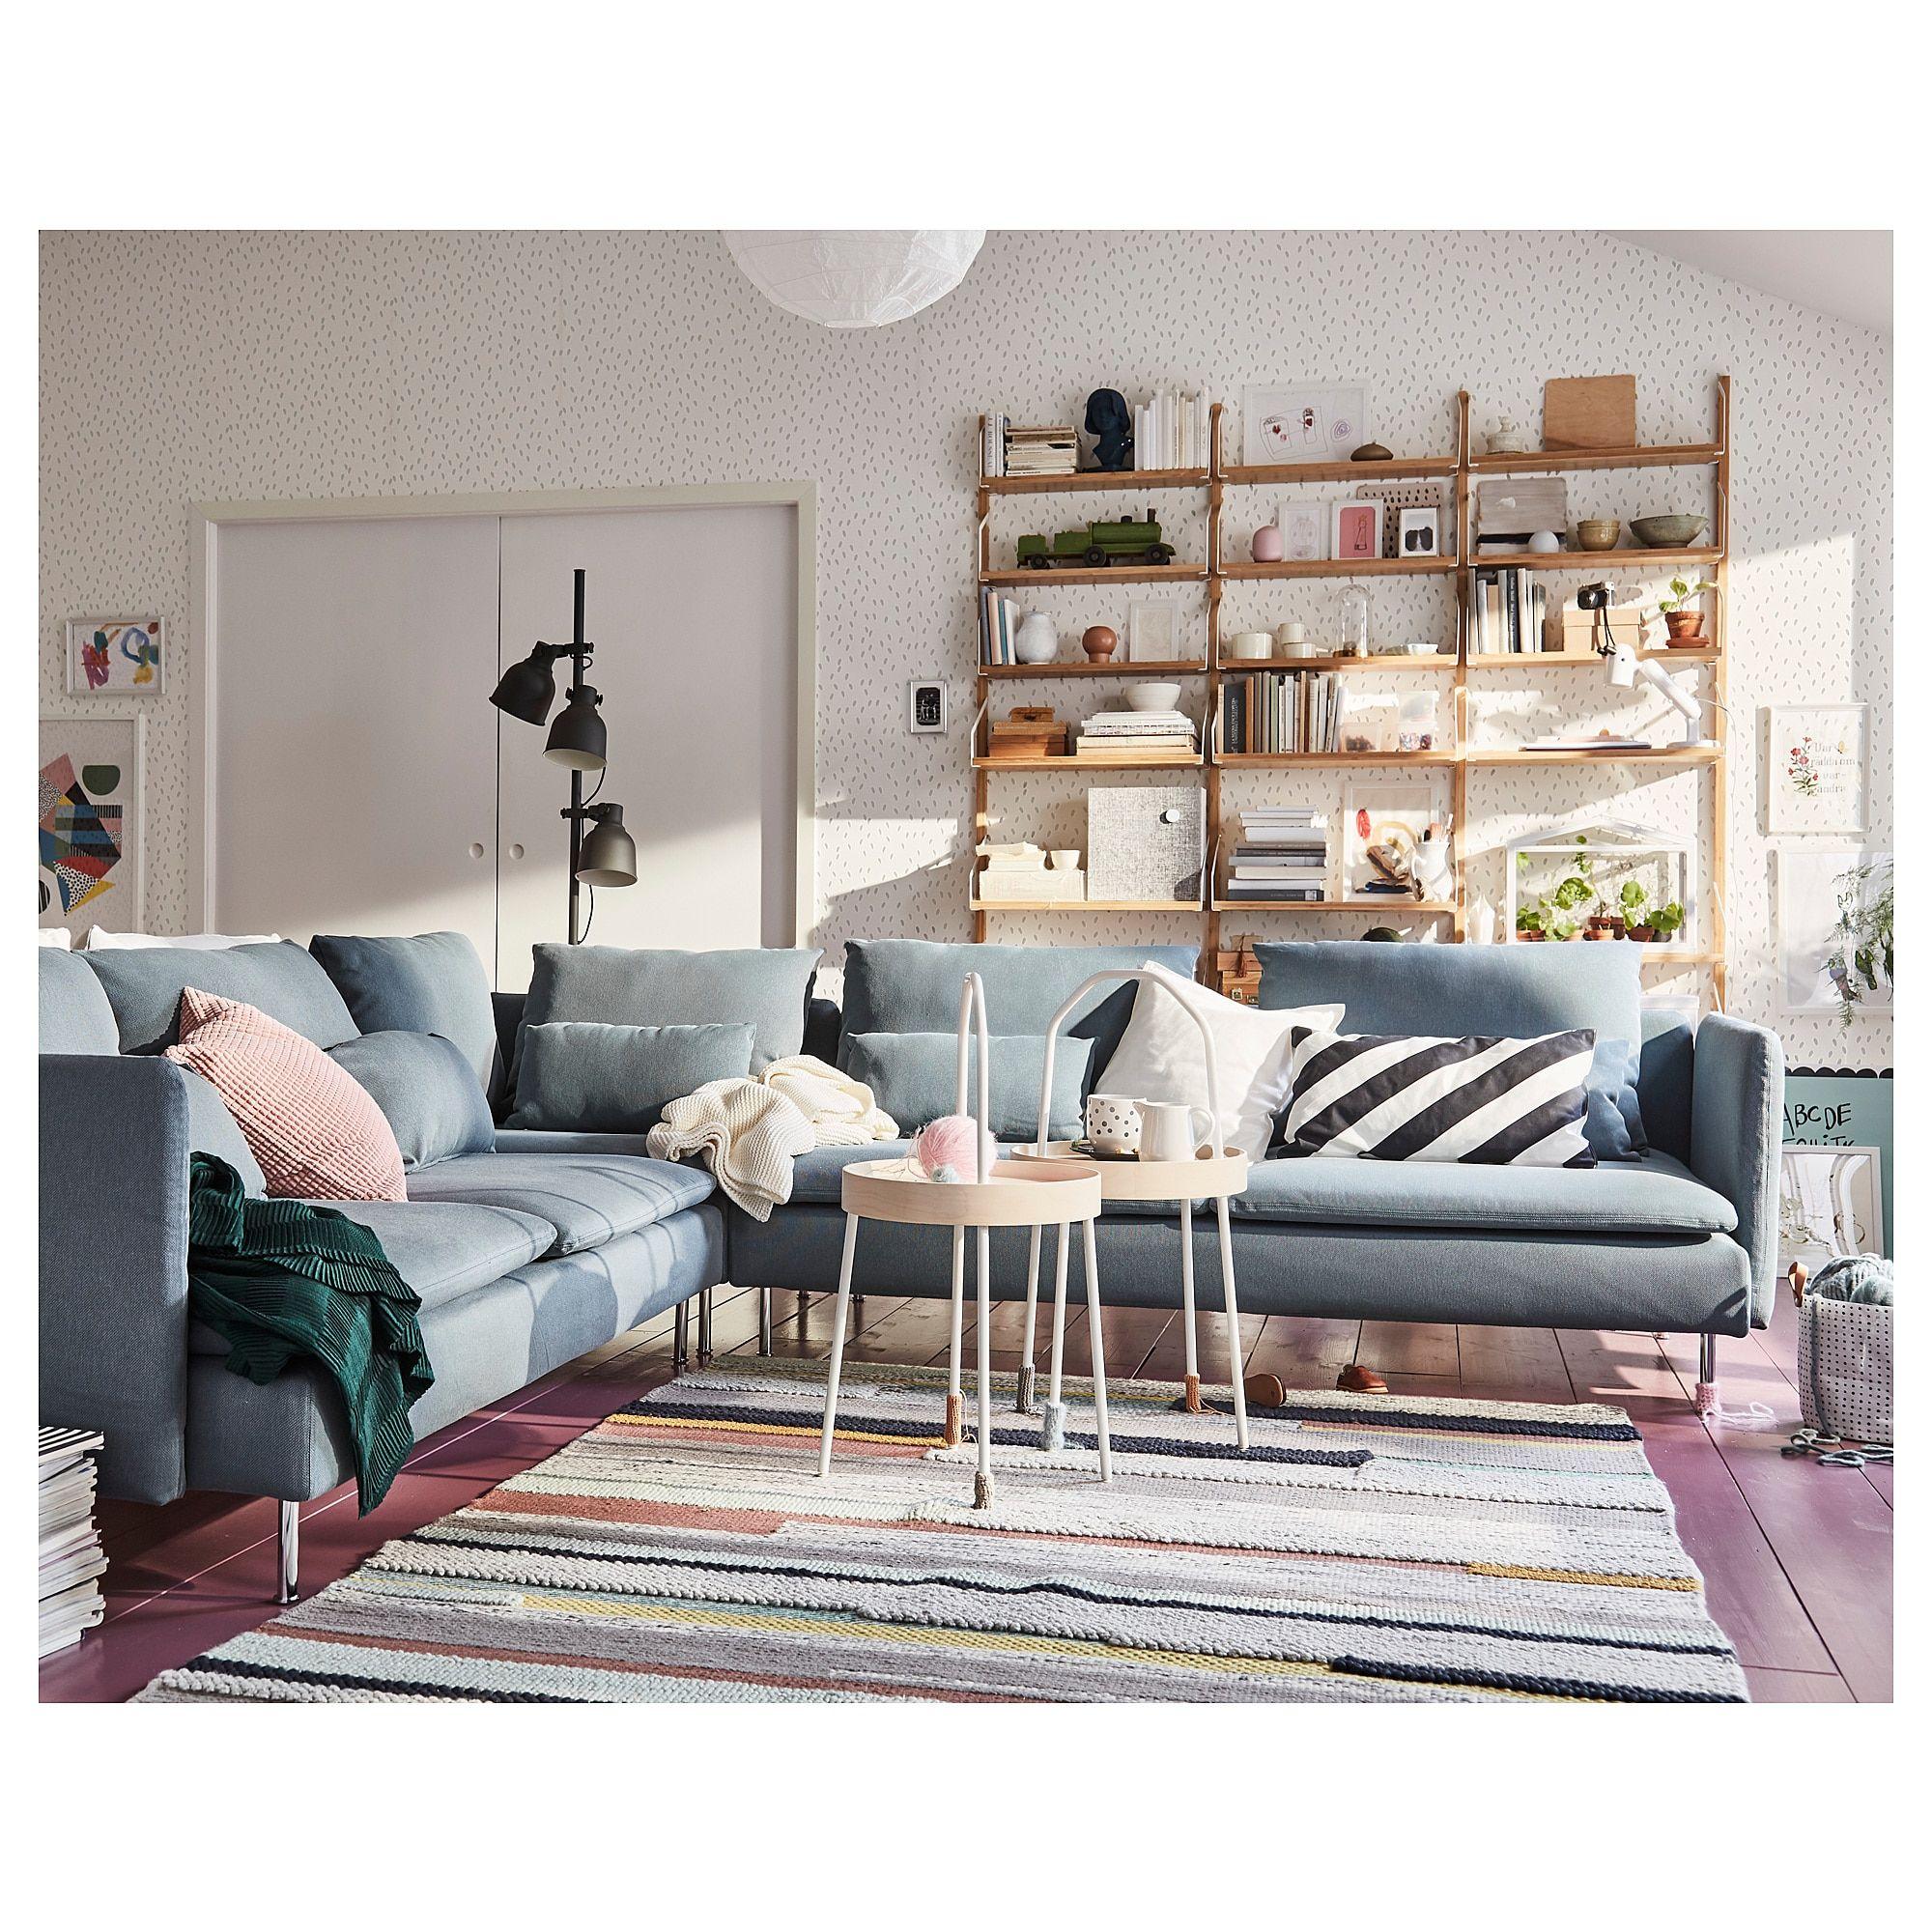 Soderhamn Sectional 5 Seat Finnsta Turquoise Ikea Small Room Design Turquoise Living Room Decor Living Room Interior